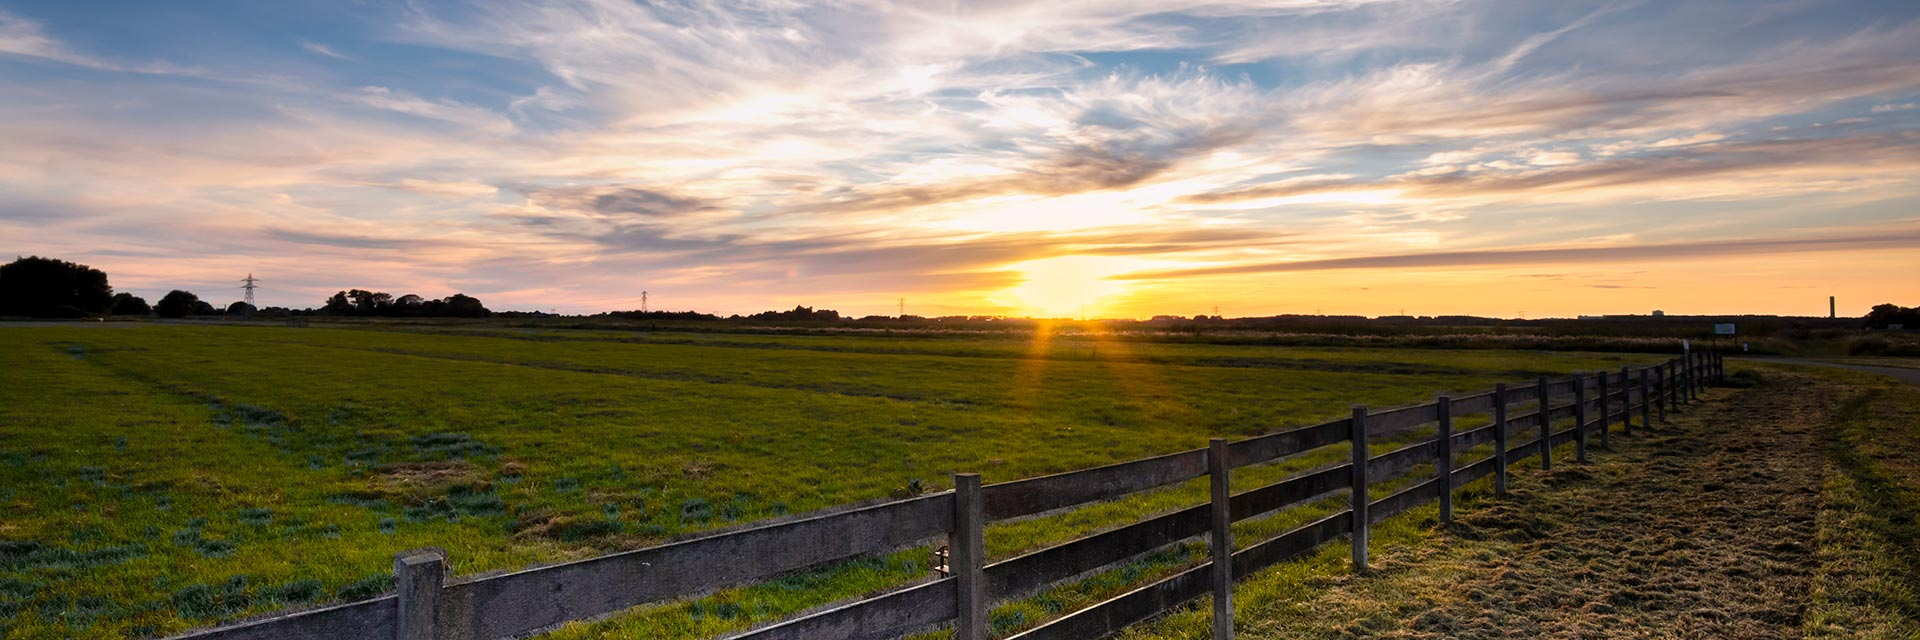 sunset, zonsondergang, schiedam, weiland, nancyderidder-fotografie.nl